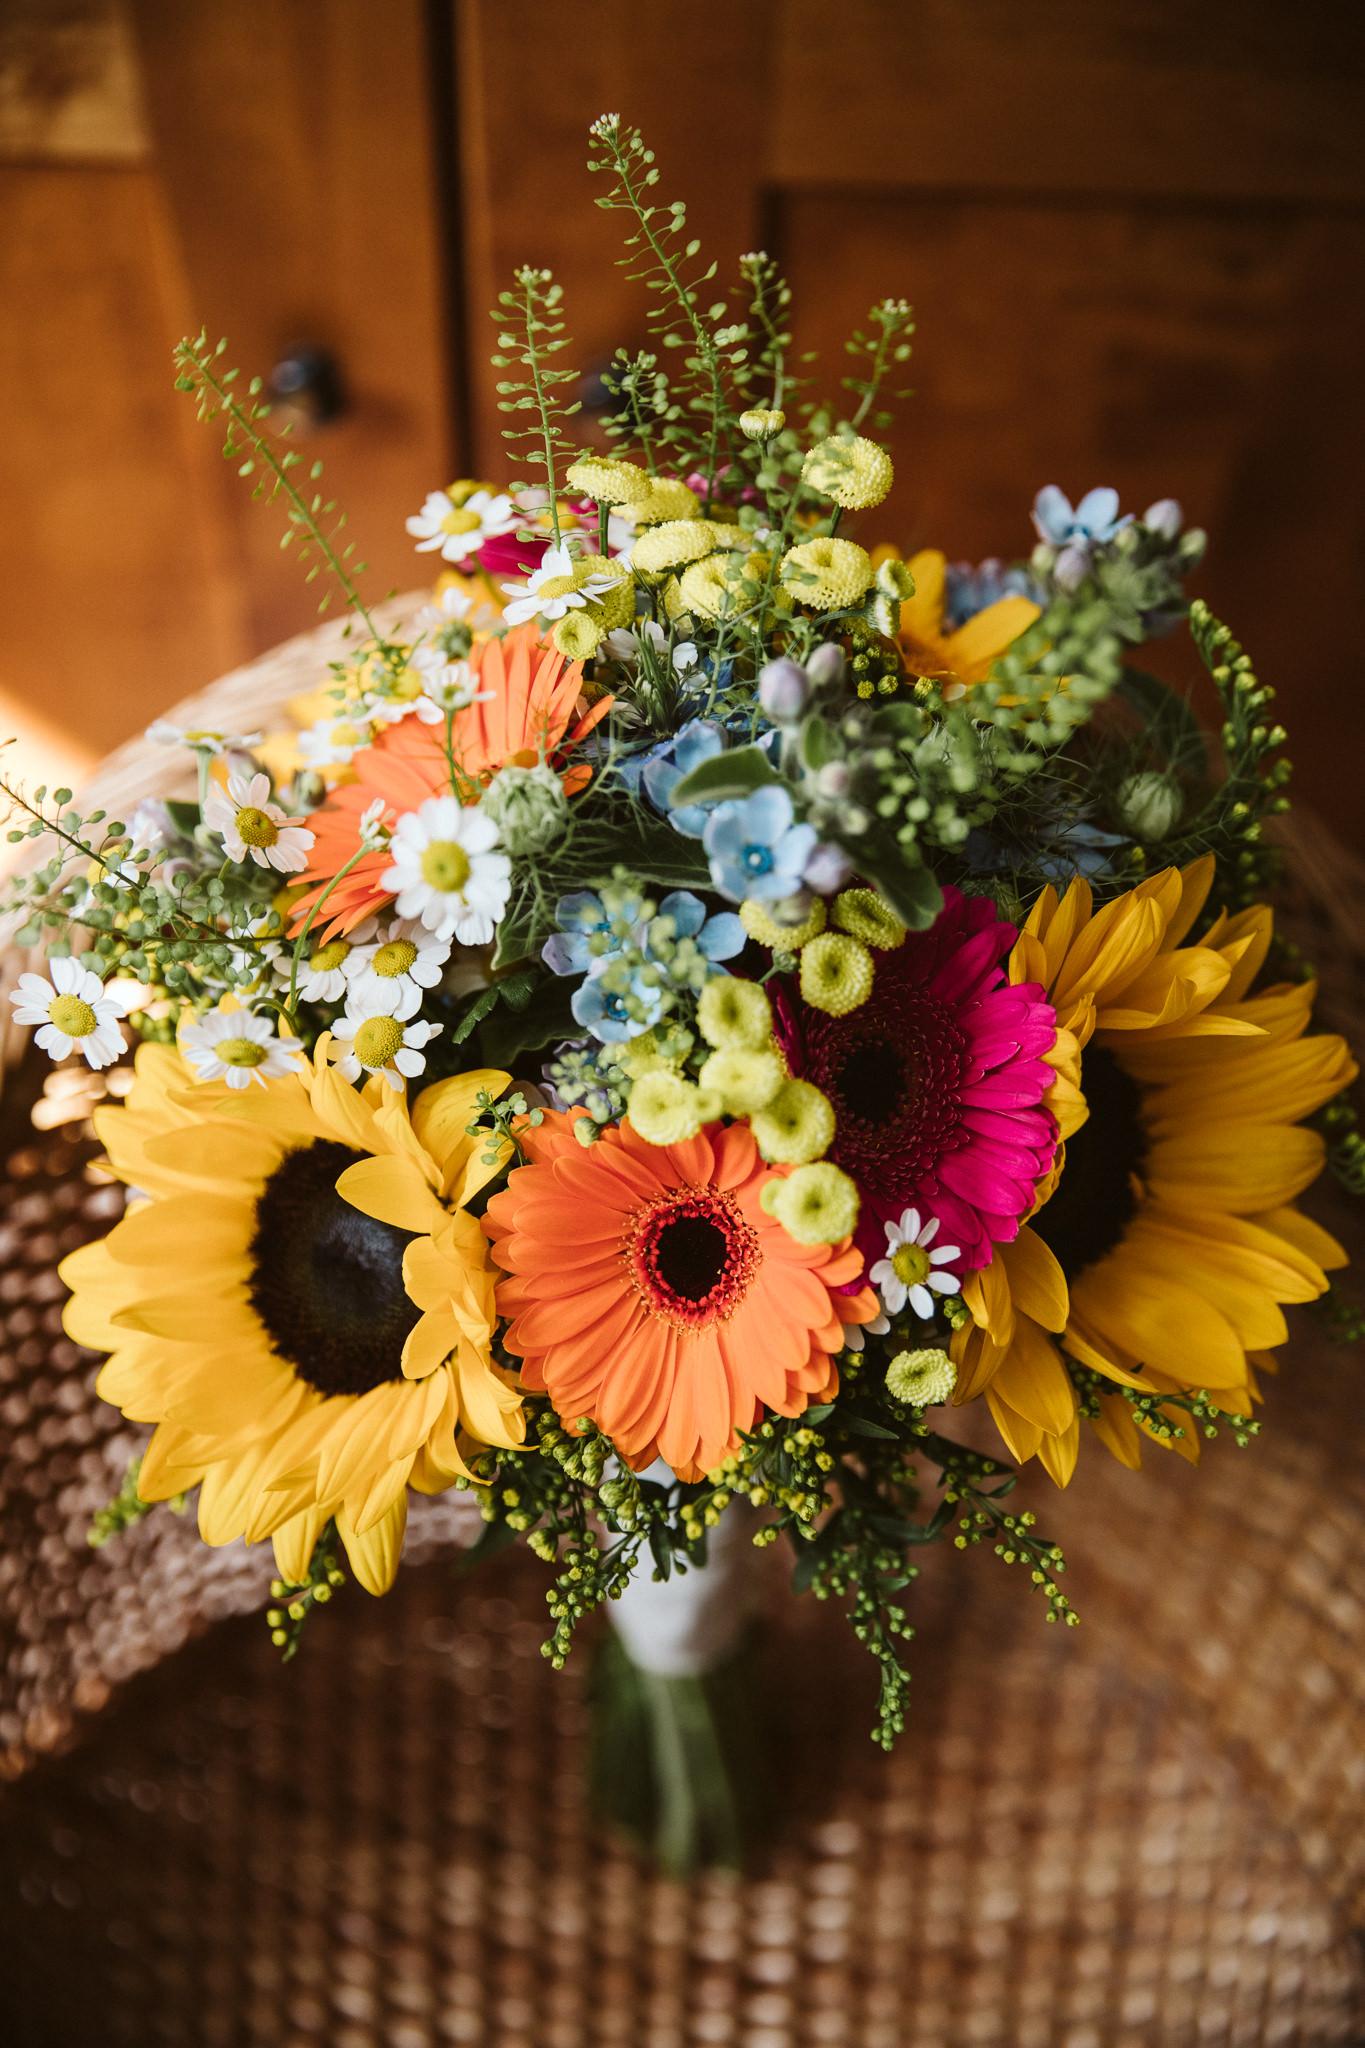 northside-farm-wedding-northumberland-margarita-hope (2).jpg